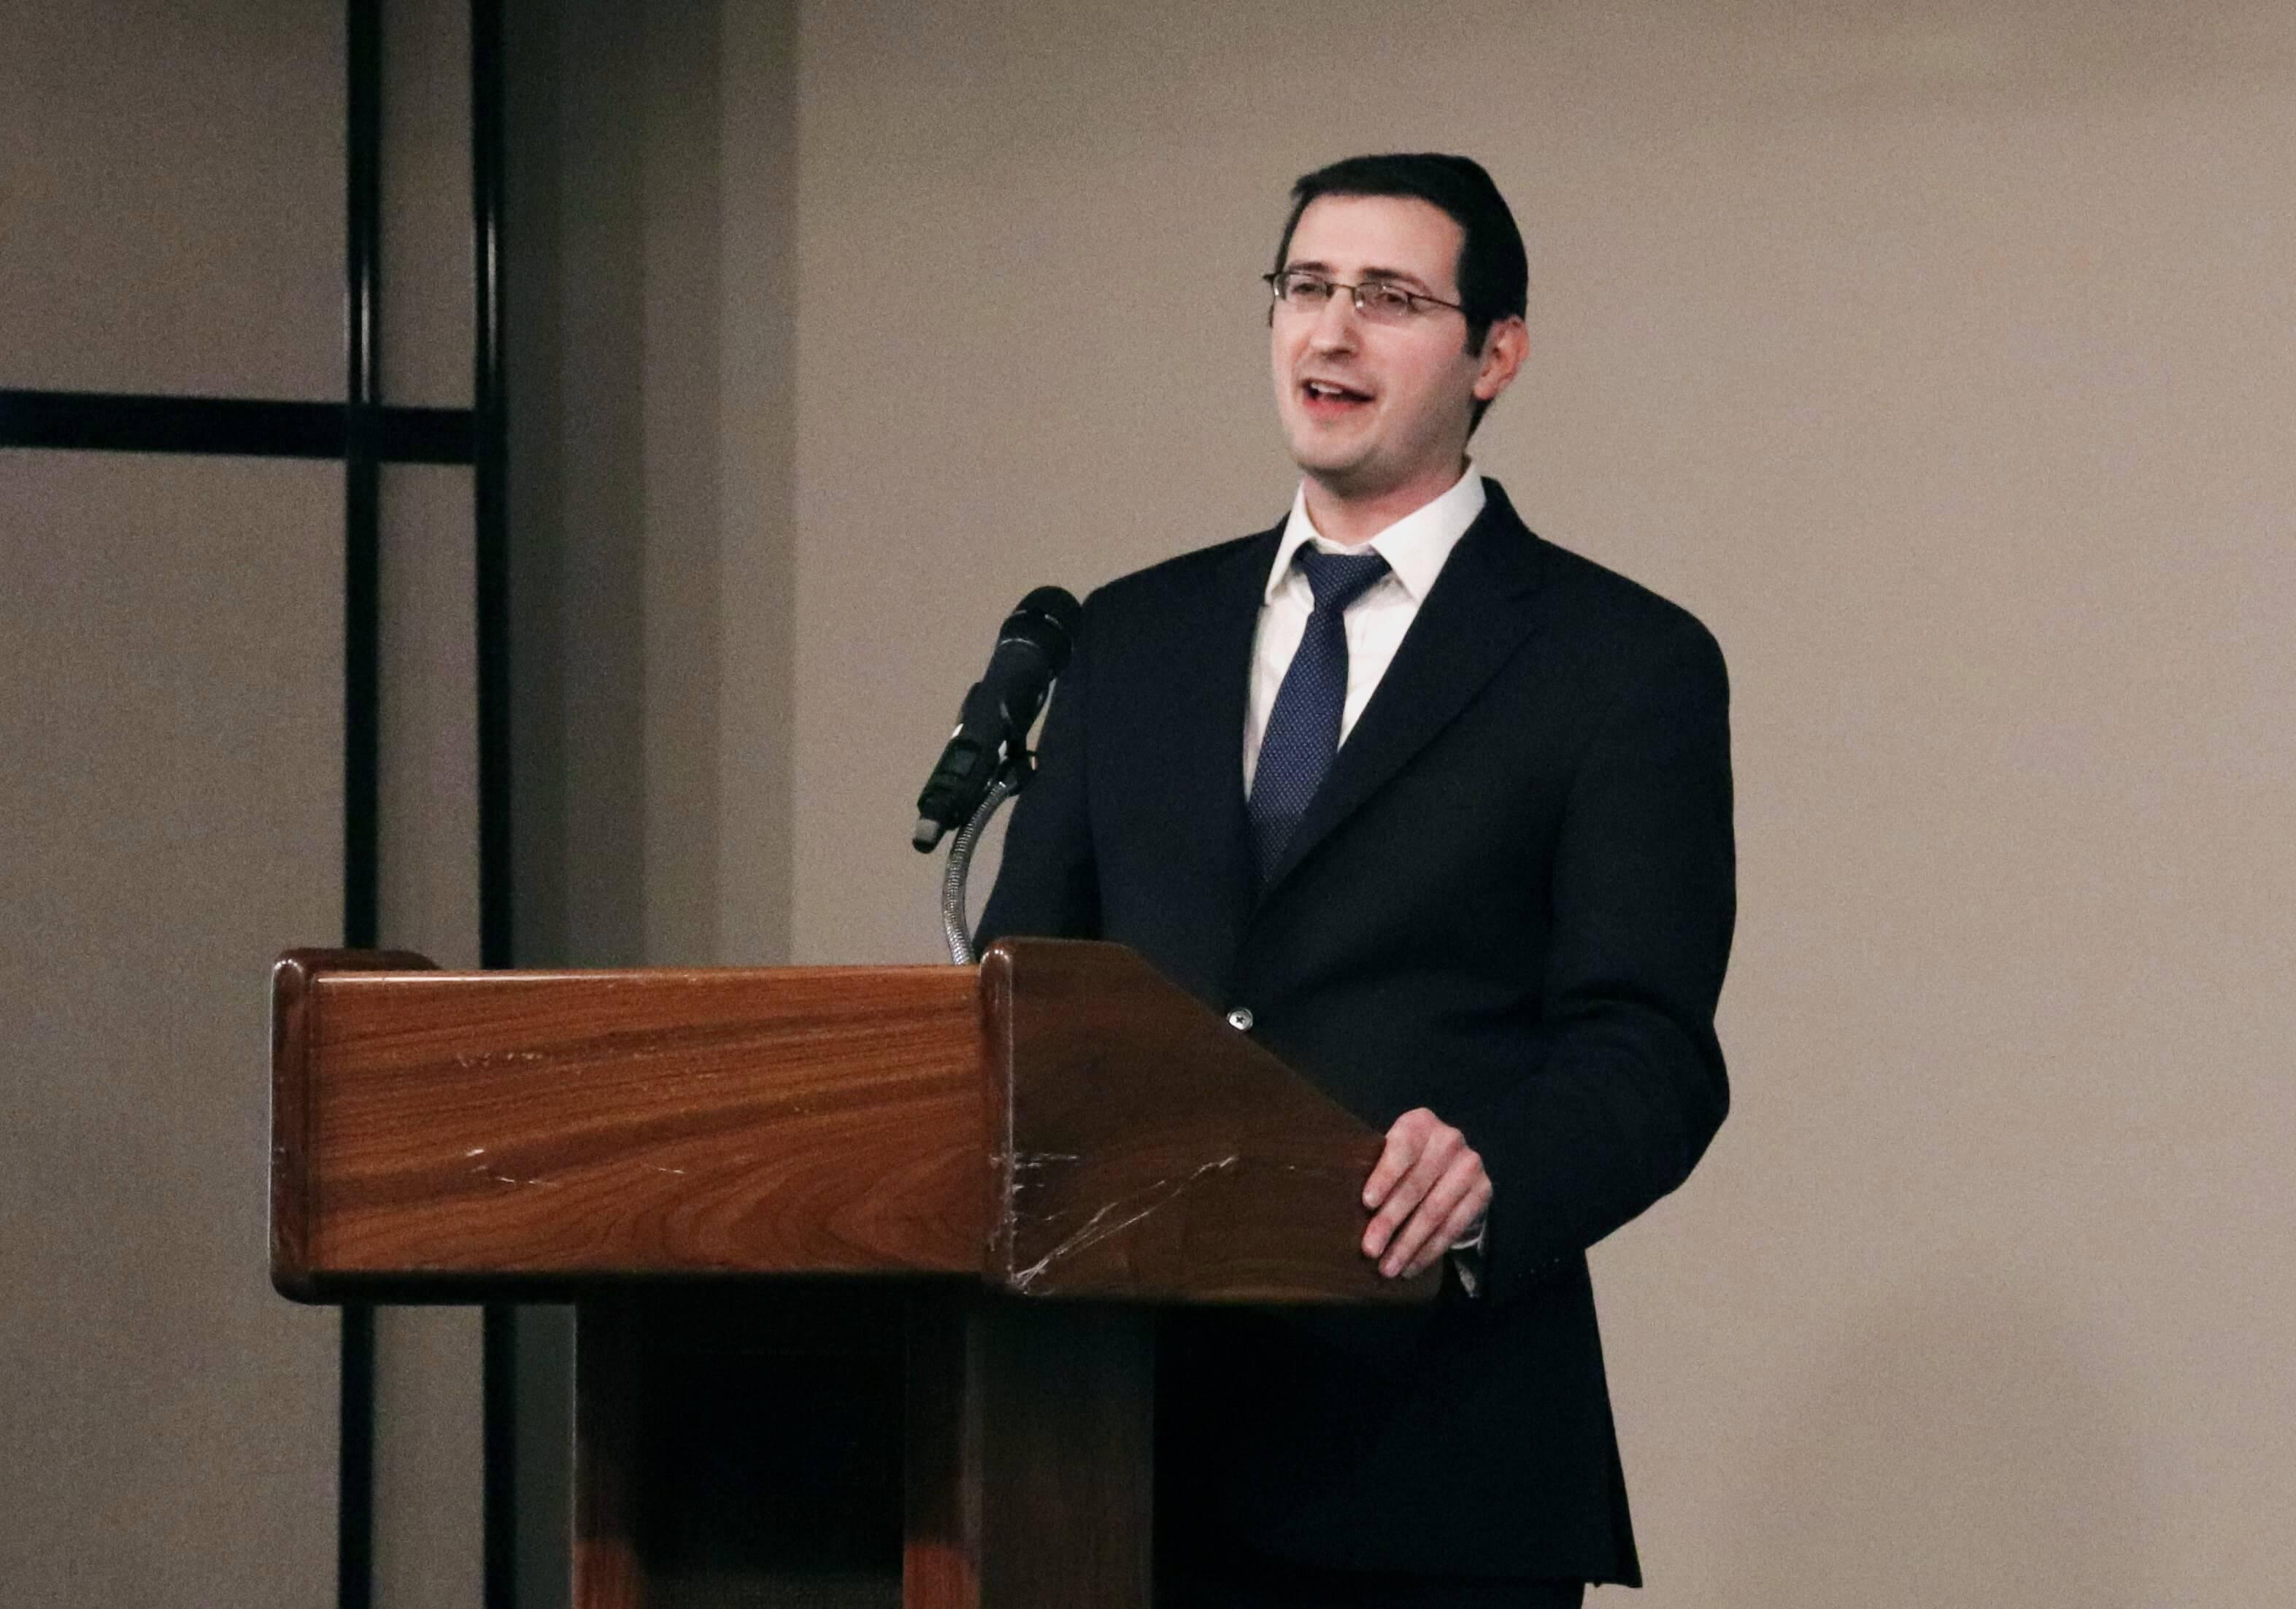 Rabbi Moshe speaking at podium